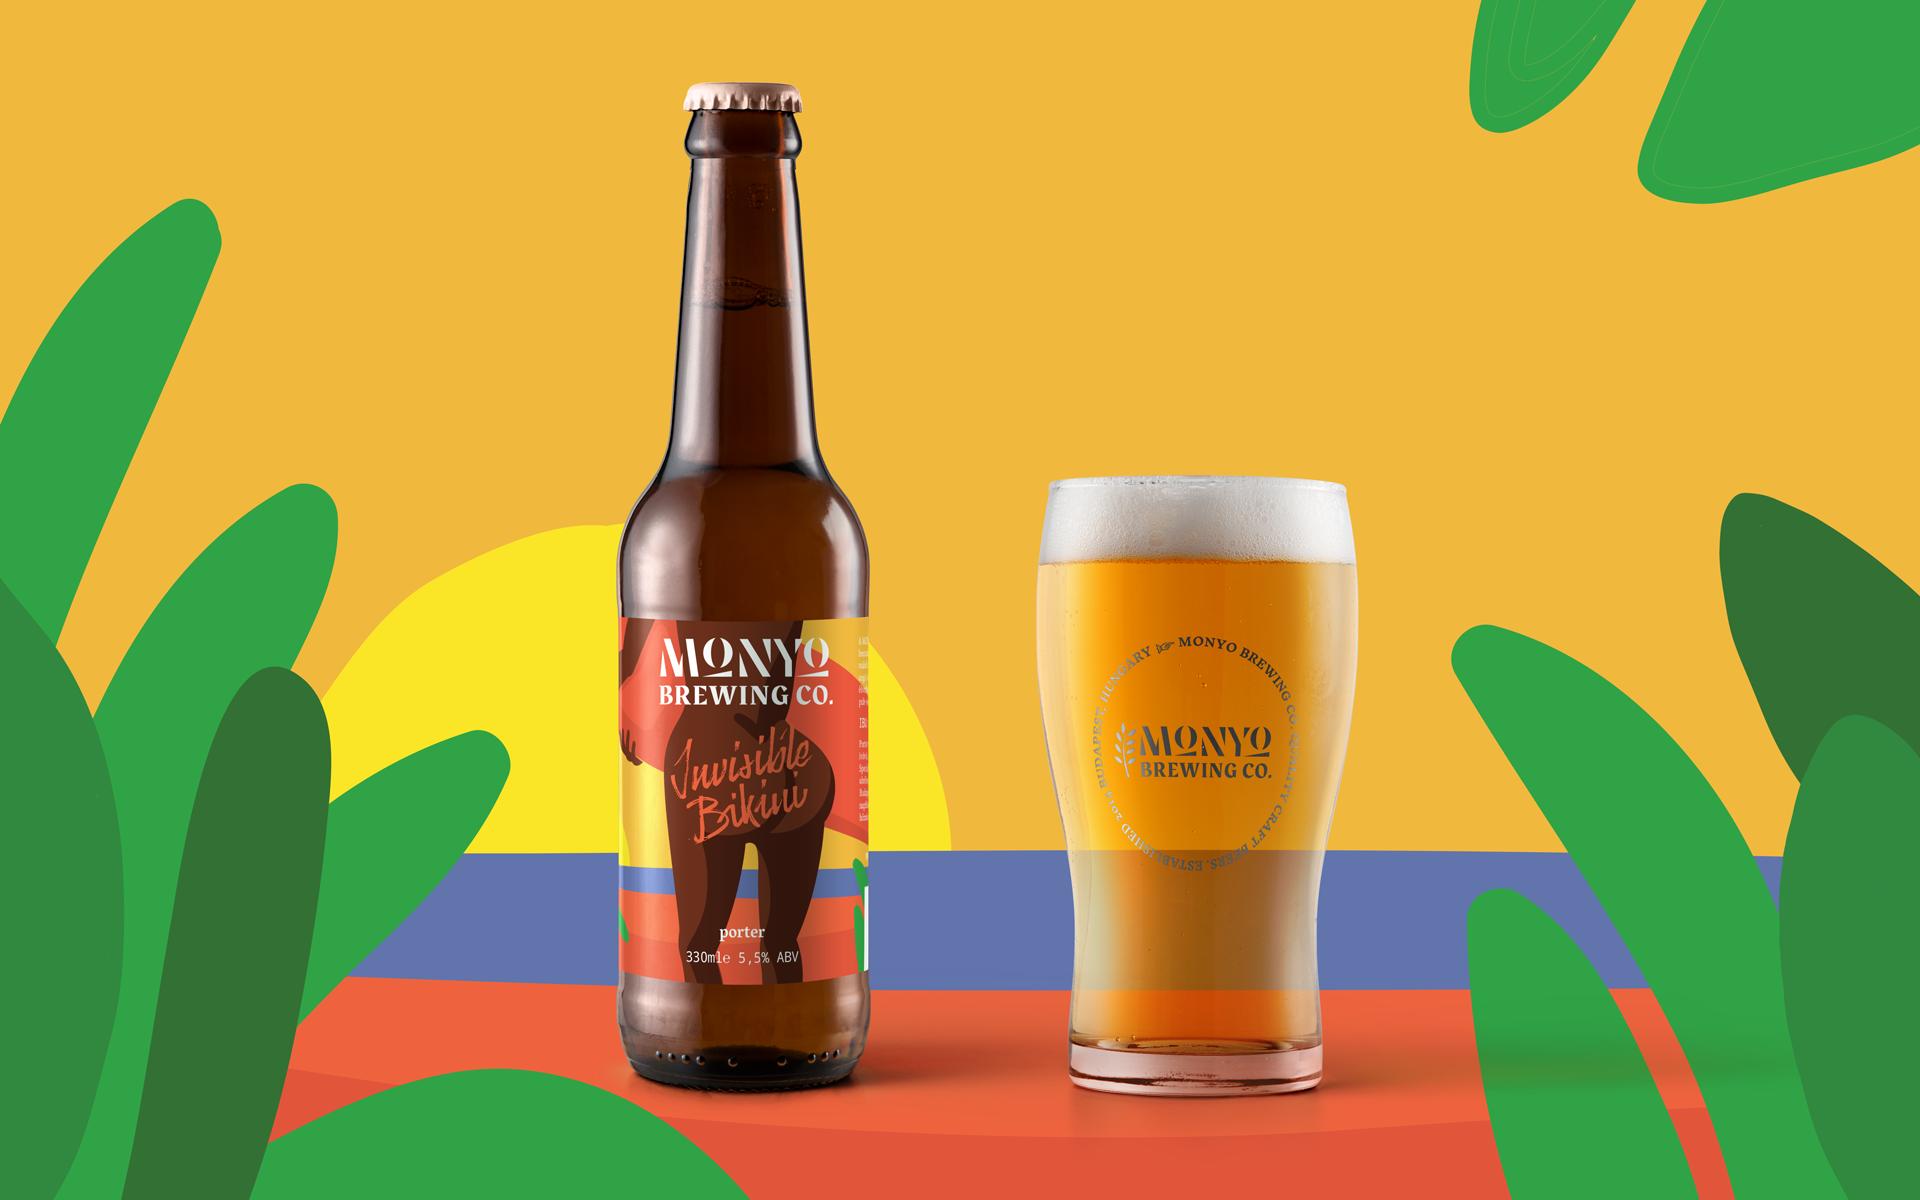 MONYO craft beer packaging \ Invisible Bikini